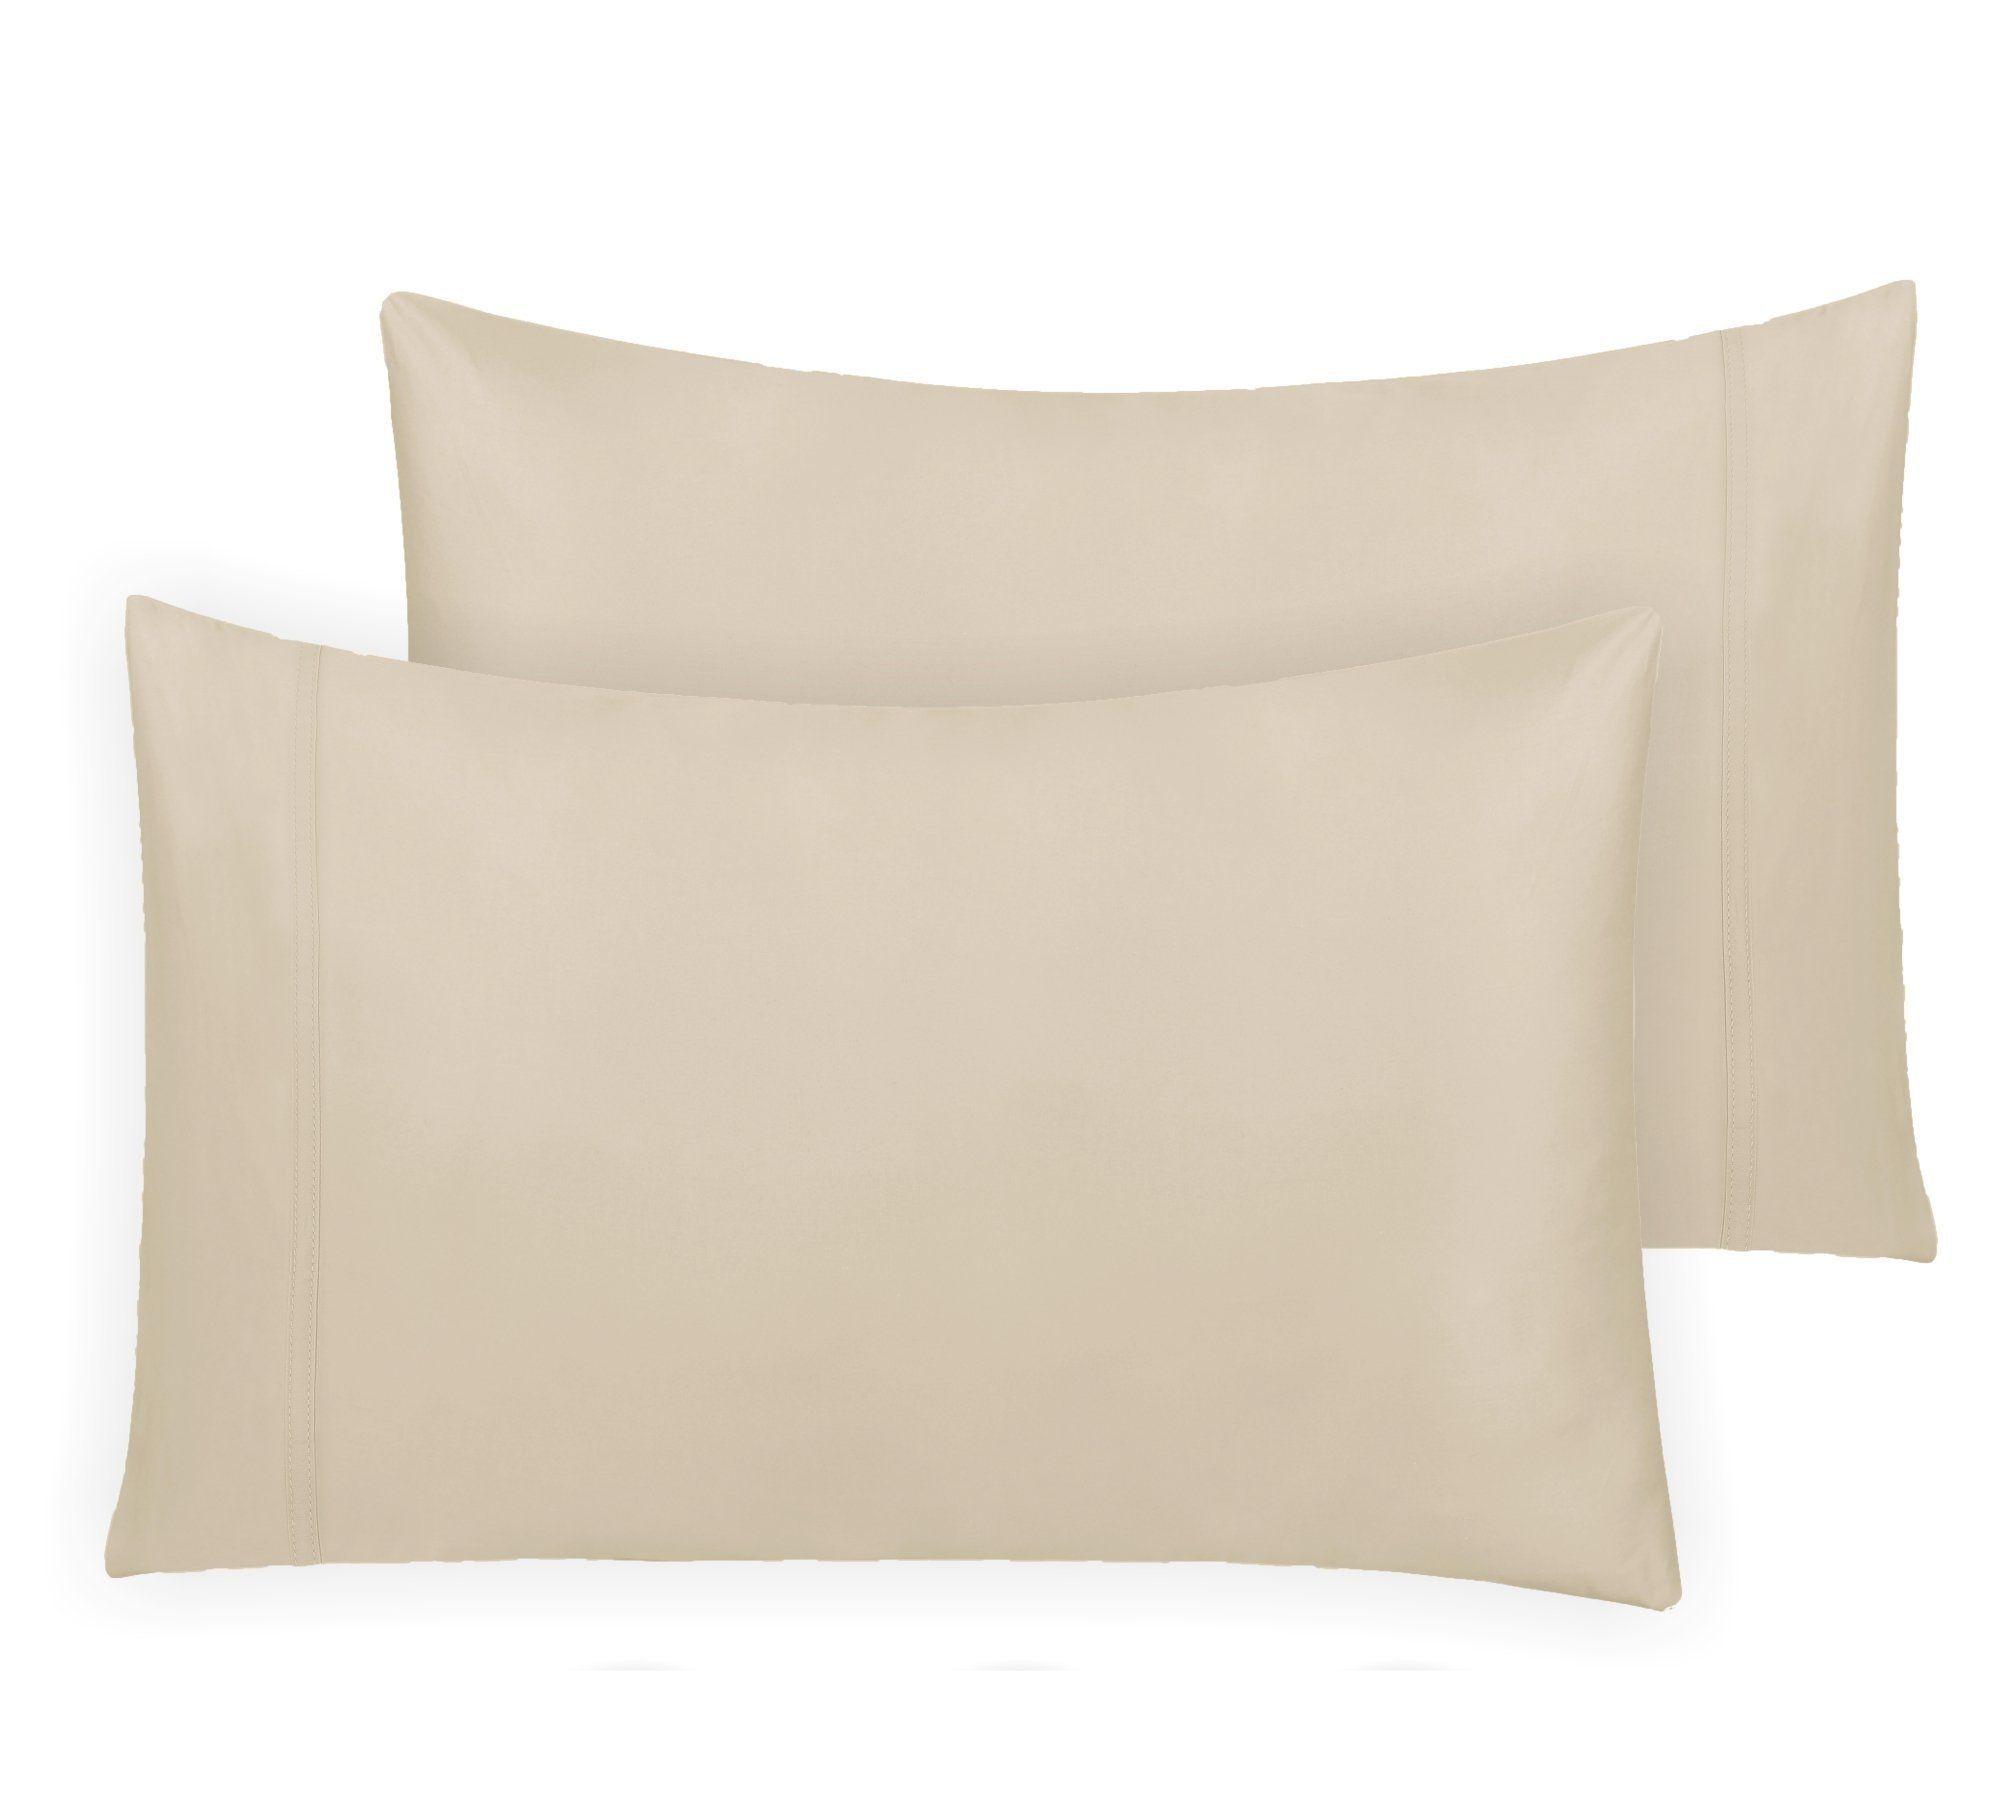 72ed94425c15 Ultra Luxe - 1000 Thread Count - 100% Cotton Sateen Sheet Set ...